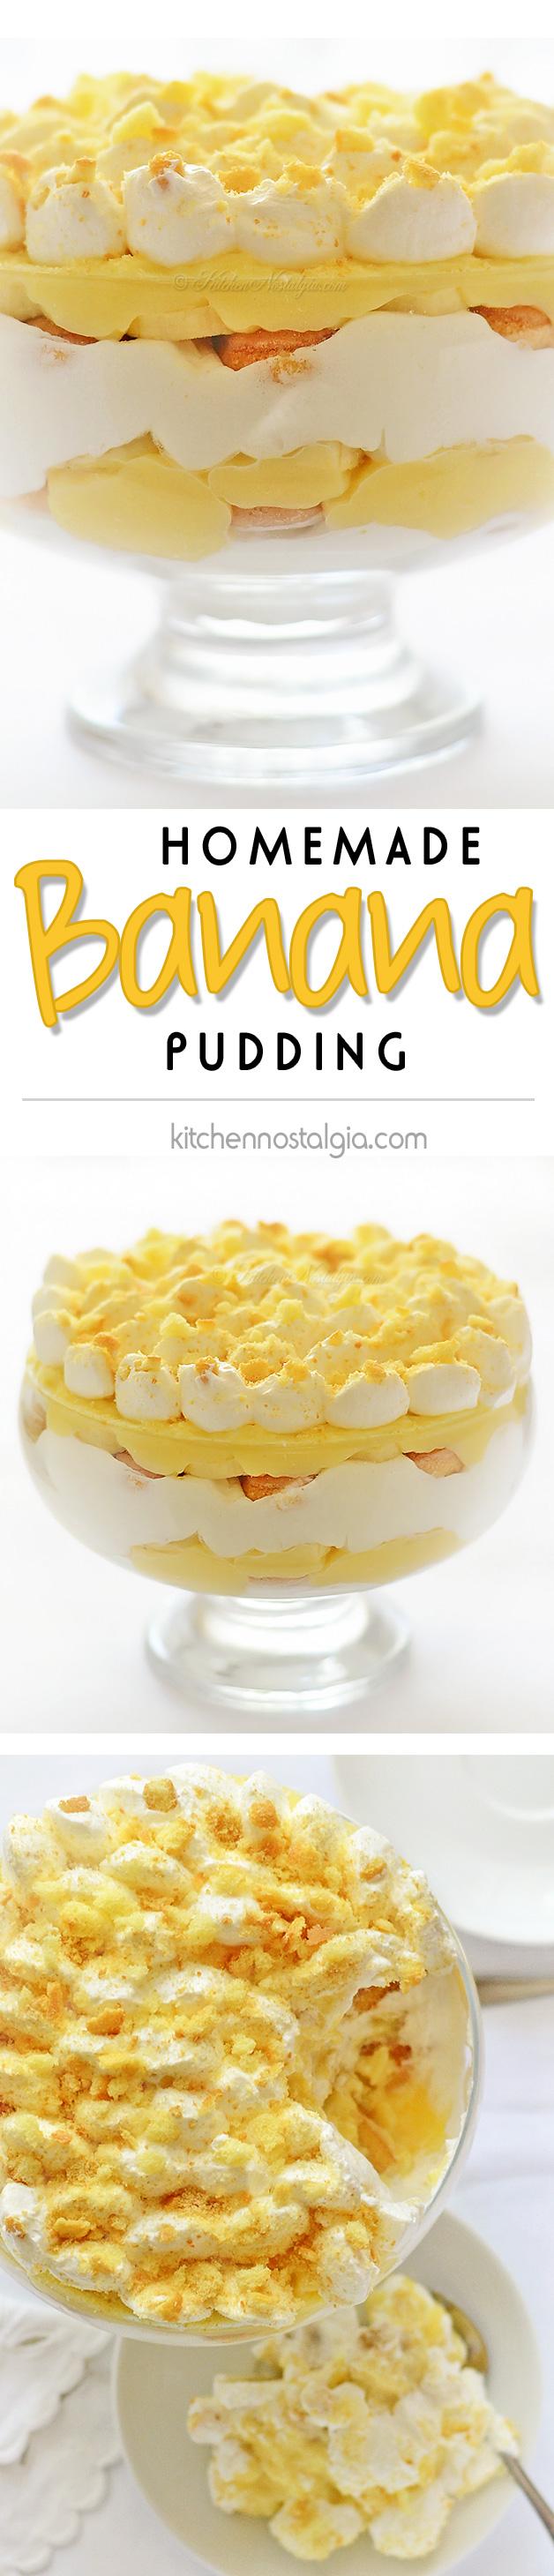 Homemade Banana Pudding - kitchennostalgia.com